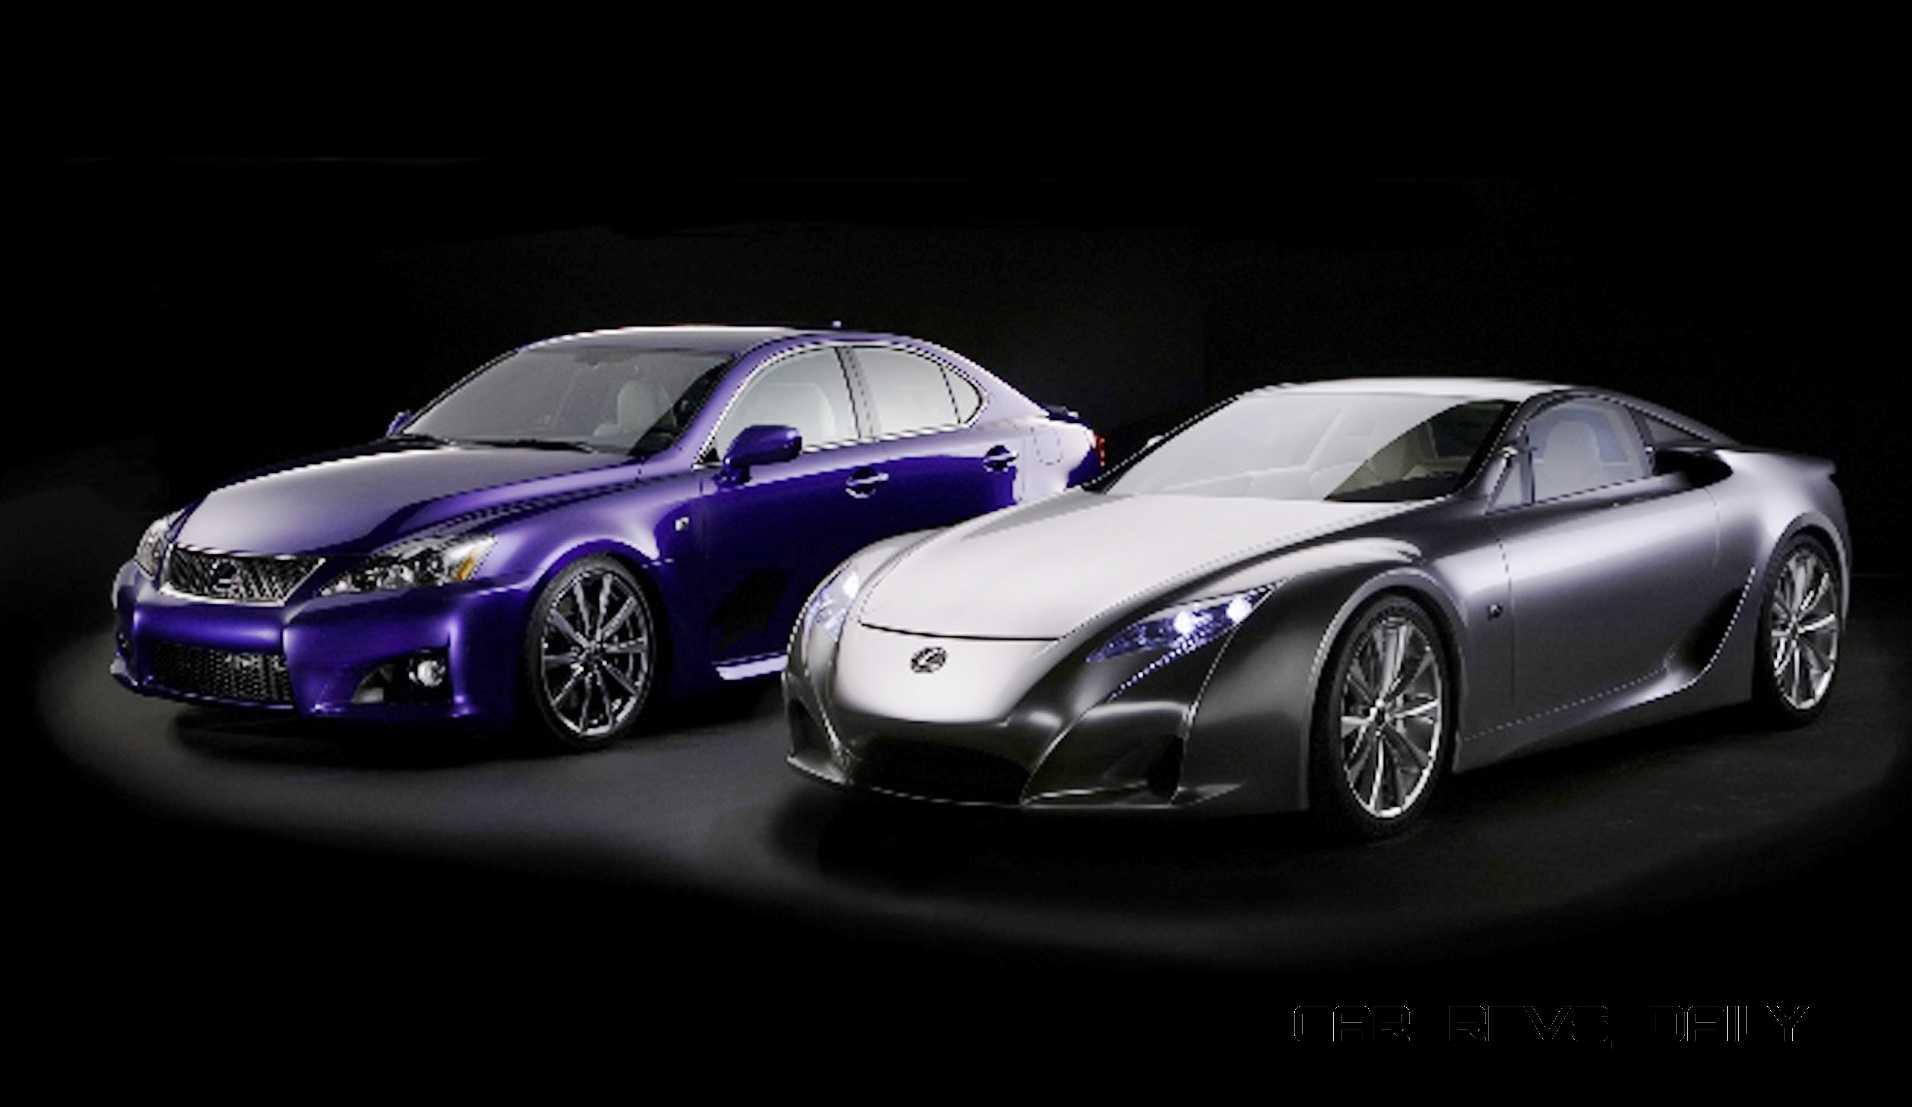 2005 Lexus LFA Coupe 11